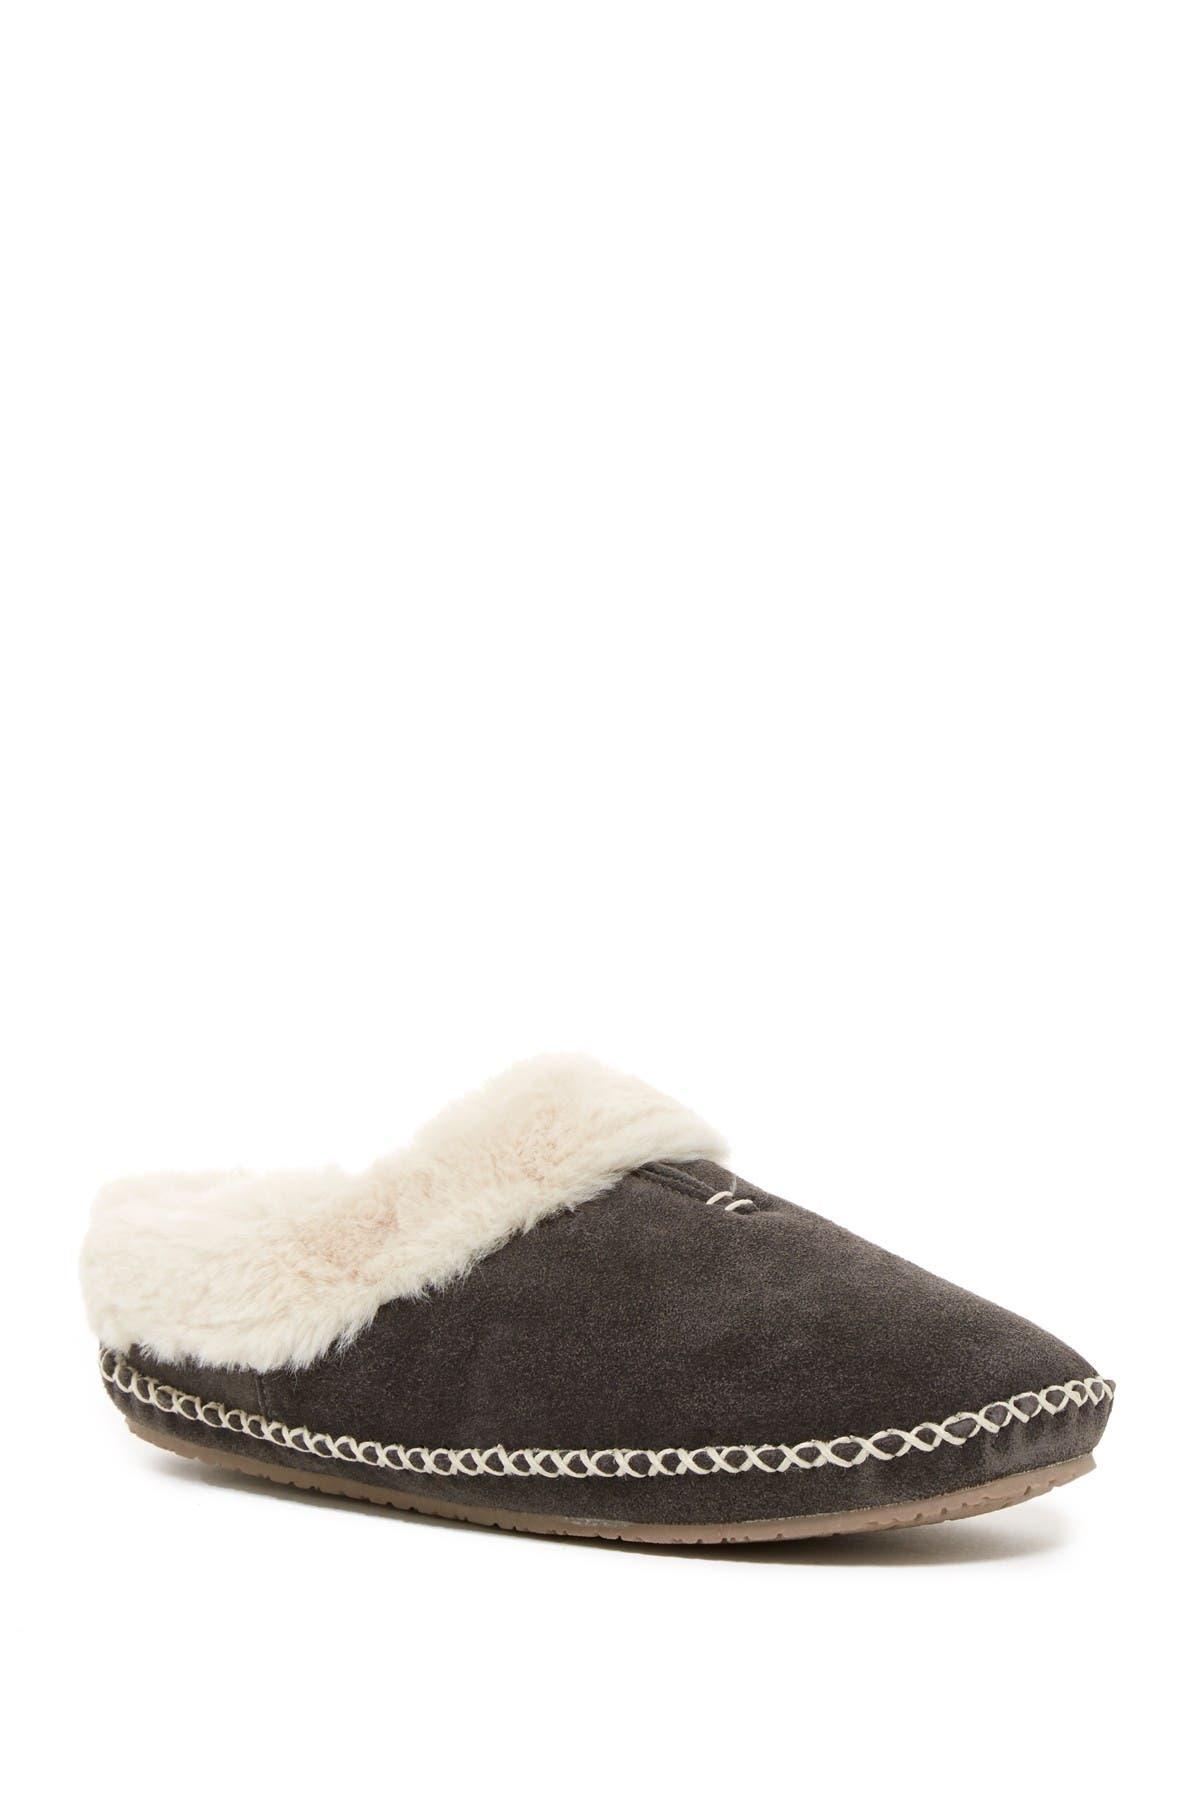 Image of Minnetonka Carolina Faux Fur Lined Clog Slipper